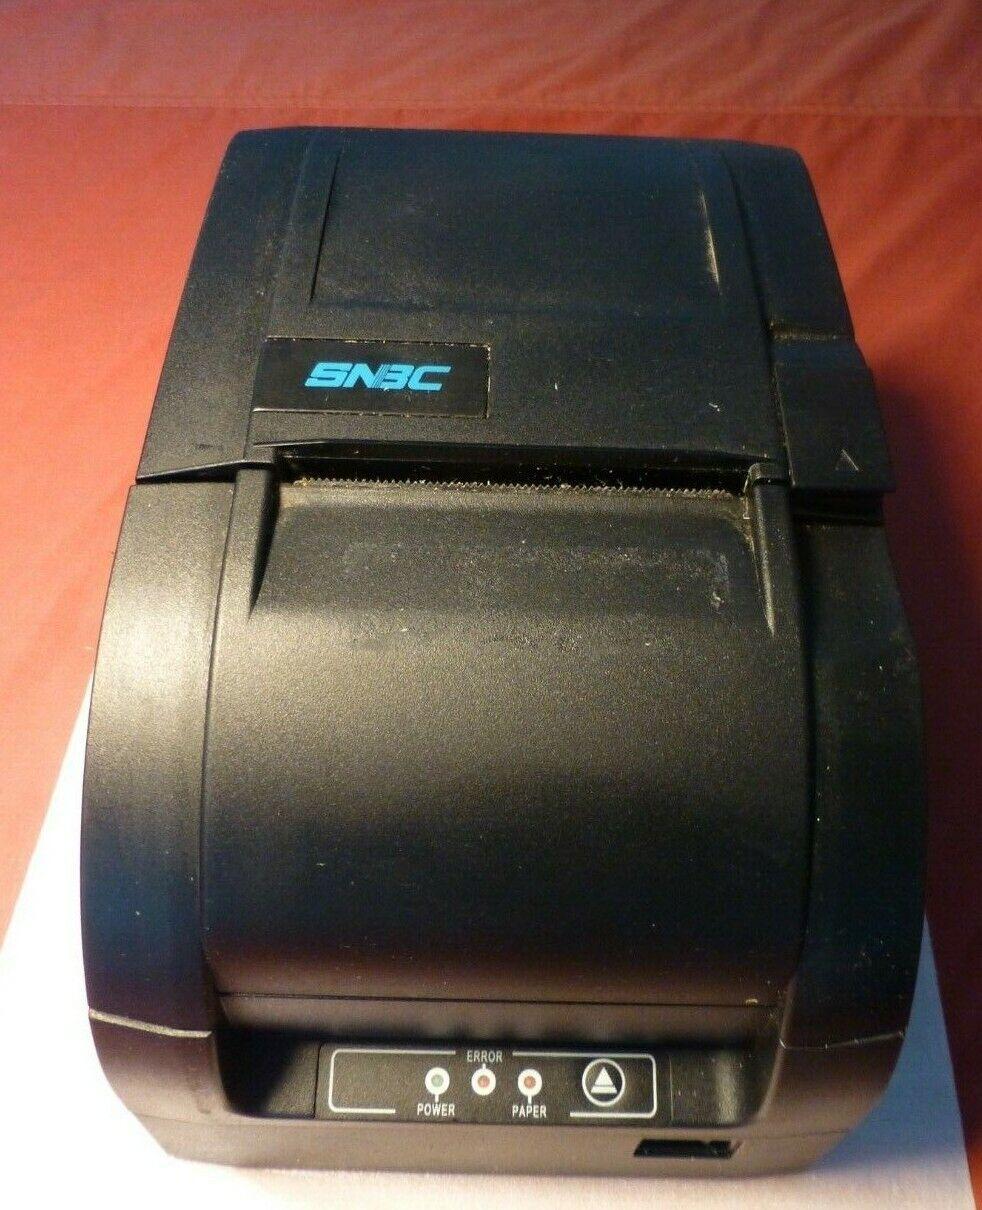 SNBC  BTP-M300 Impact  Kitchen Printer ETHERNET  Auto Cutter  Dark Gray 132081-E